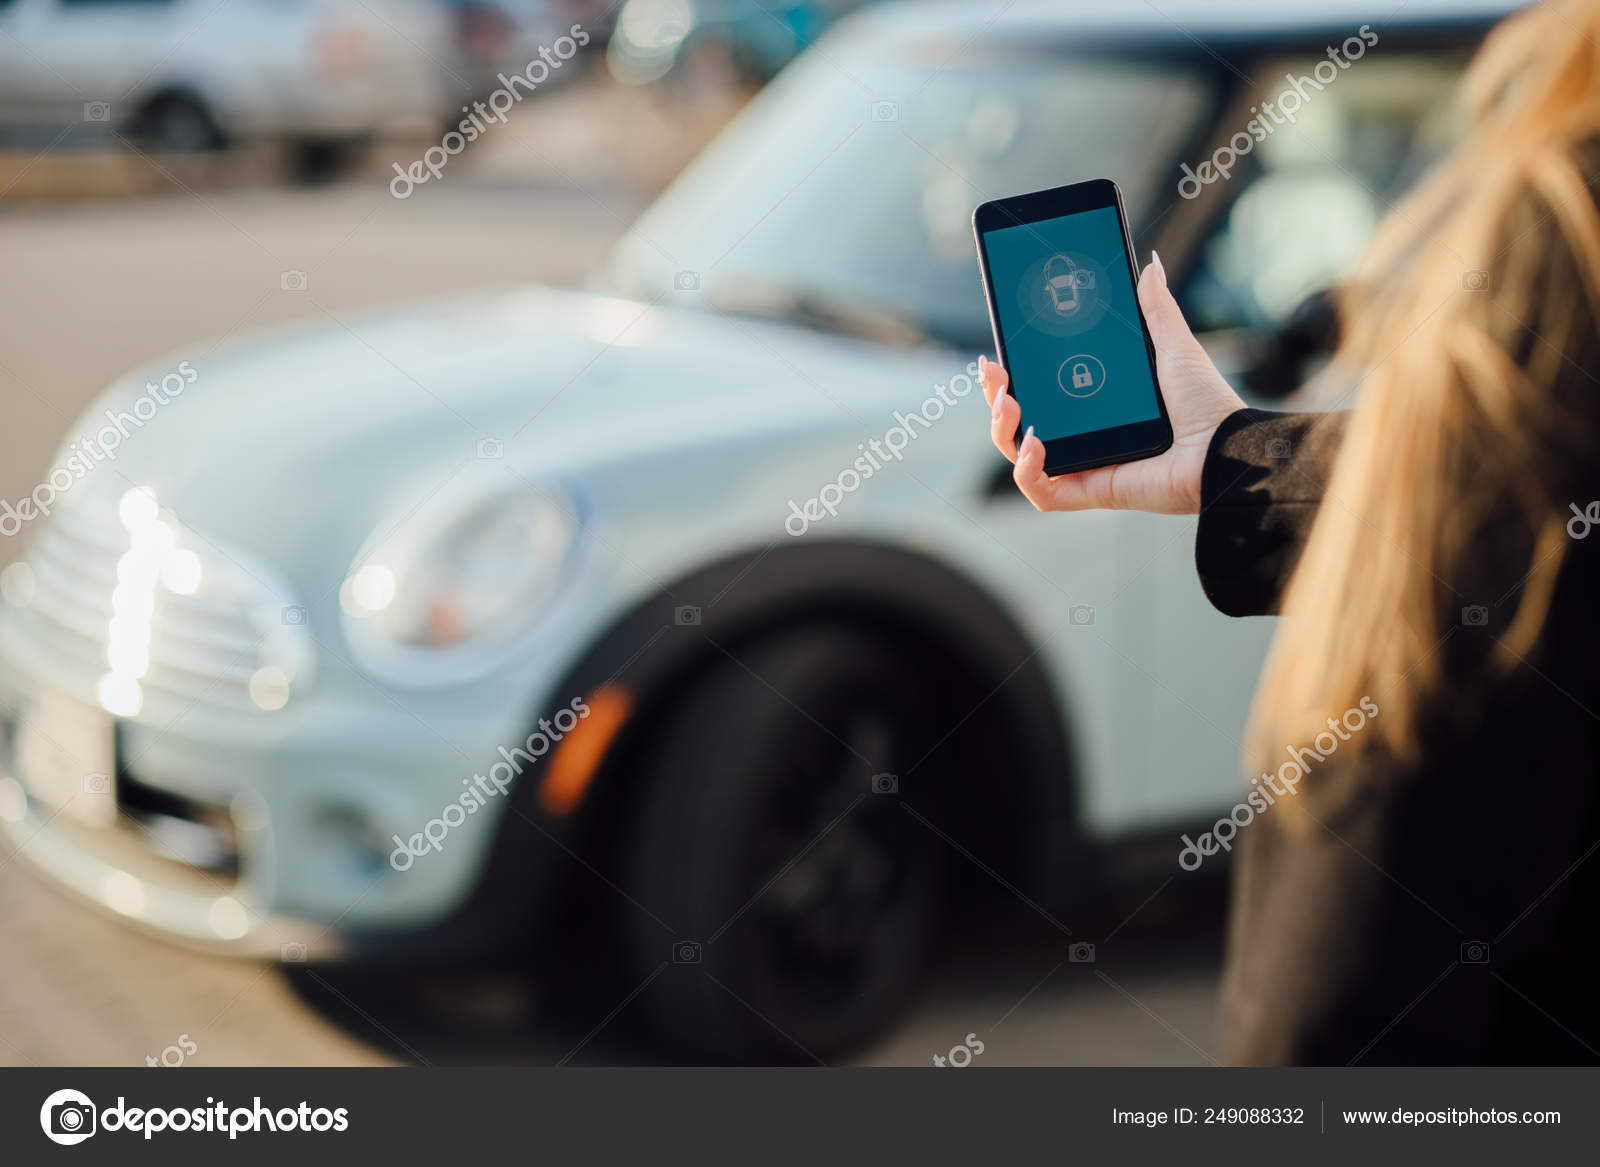 Business Woman Car Woman Using Smartphone Car Mobile Phone Apps Stock Editorial Photo C Vaksmanv101 249088332